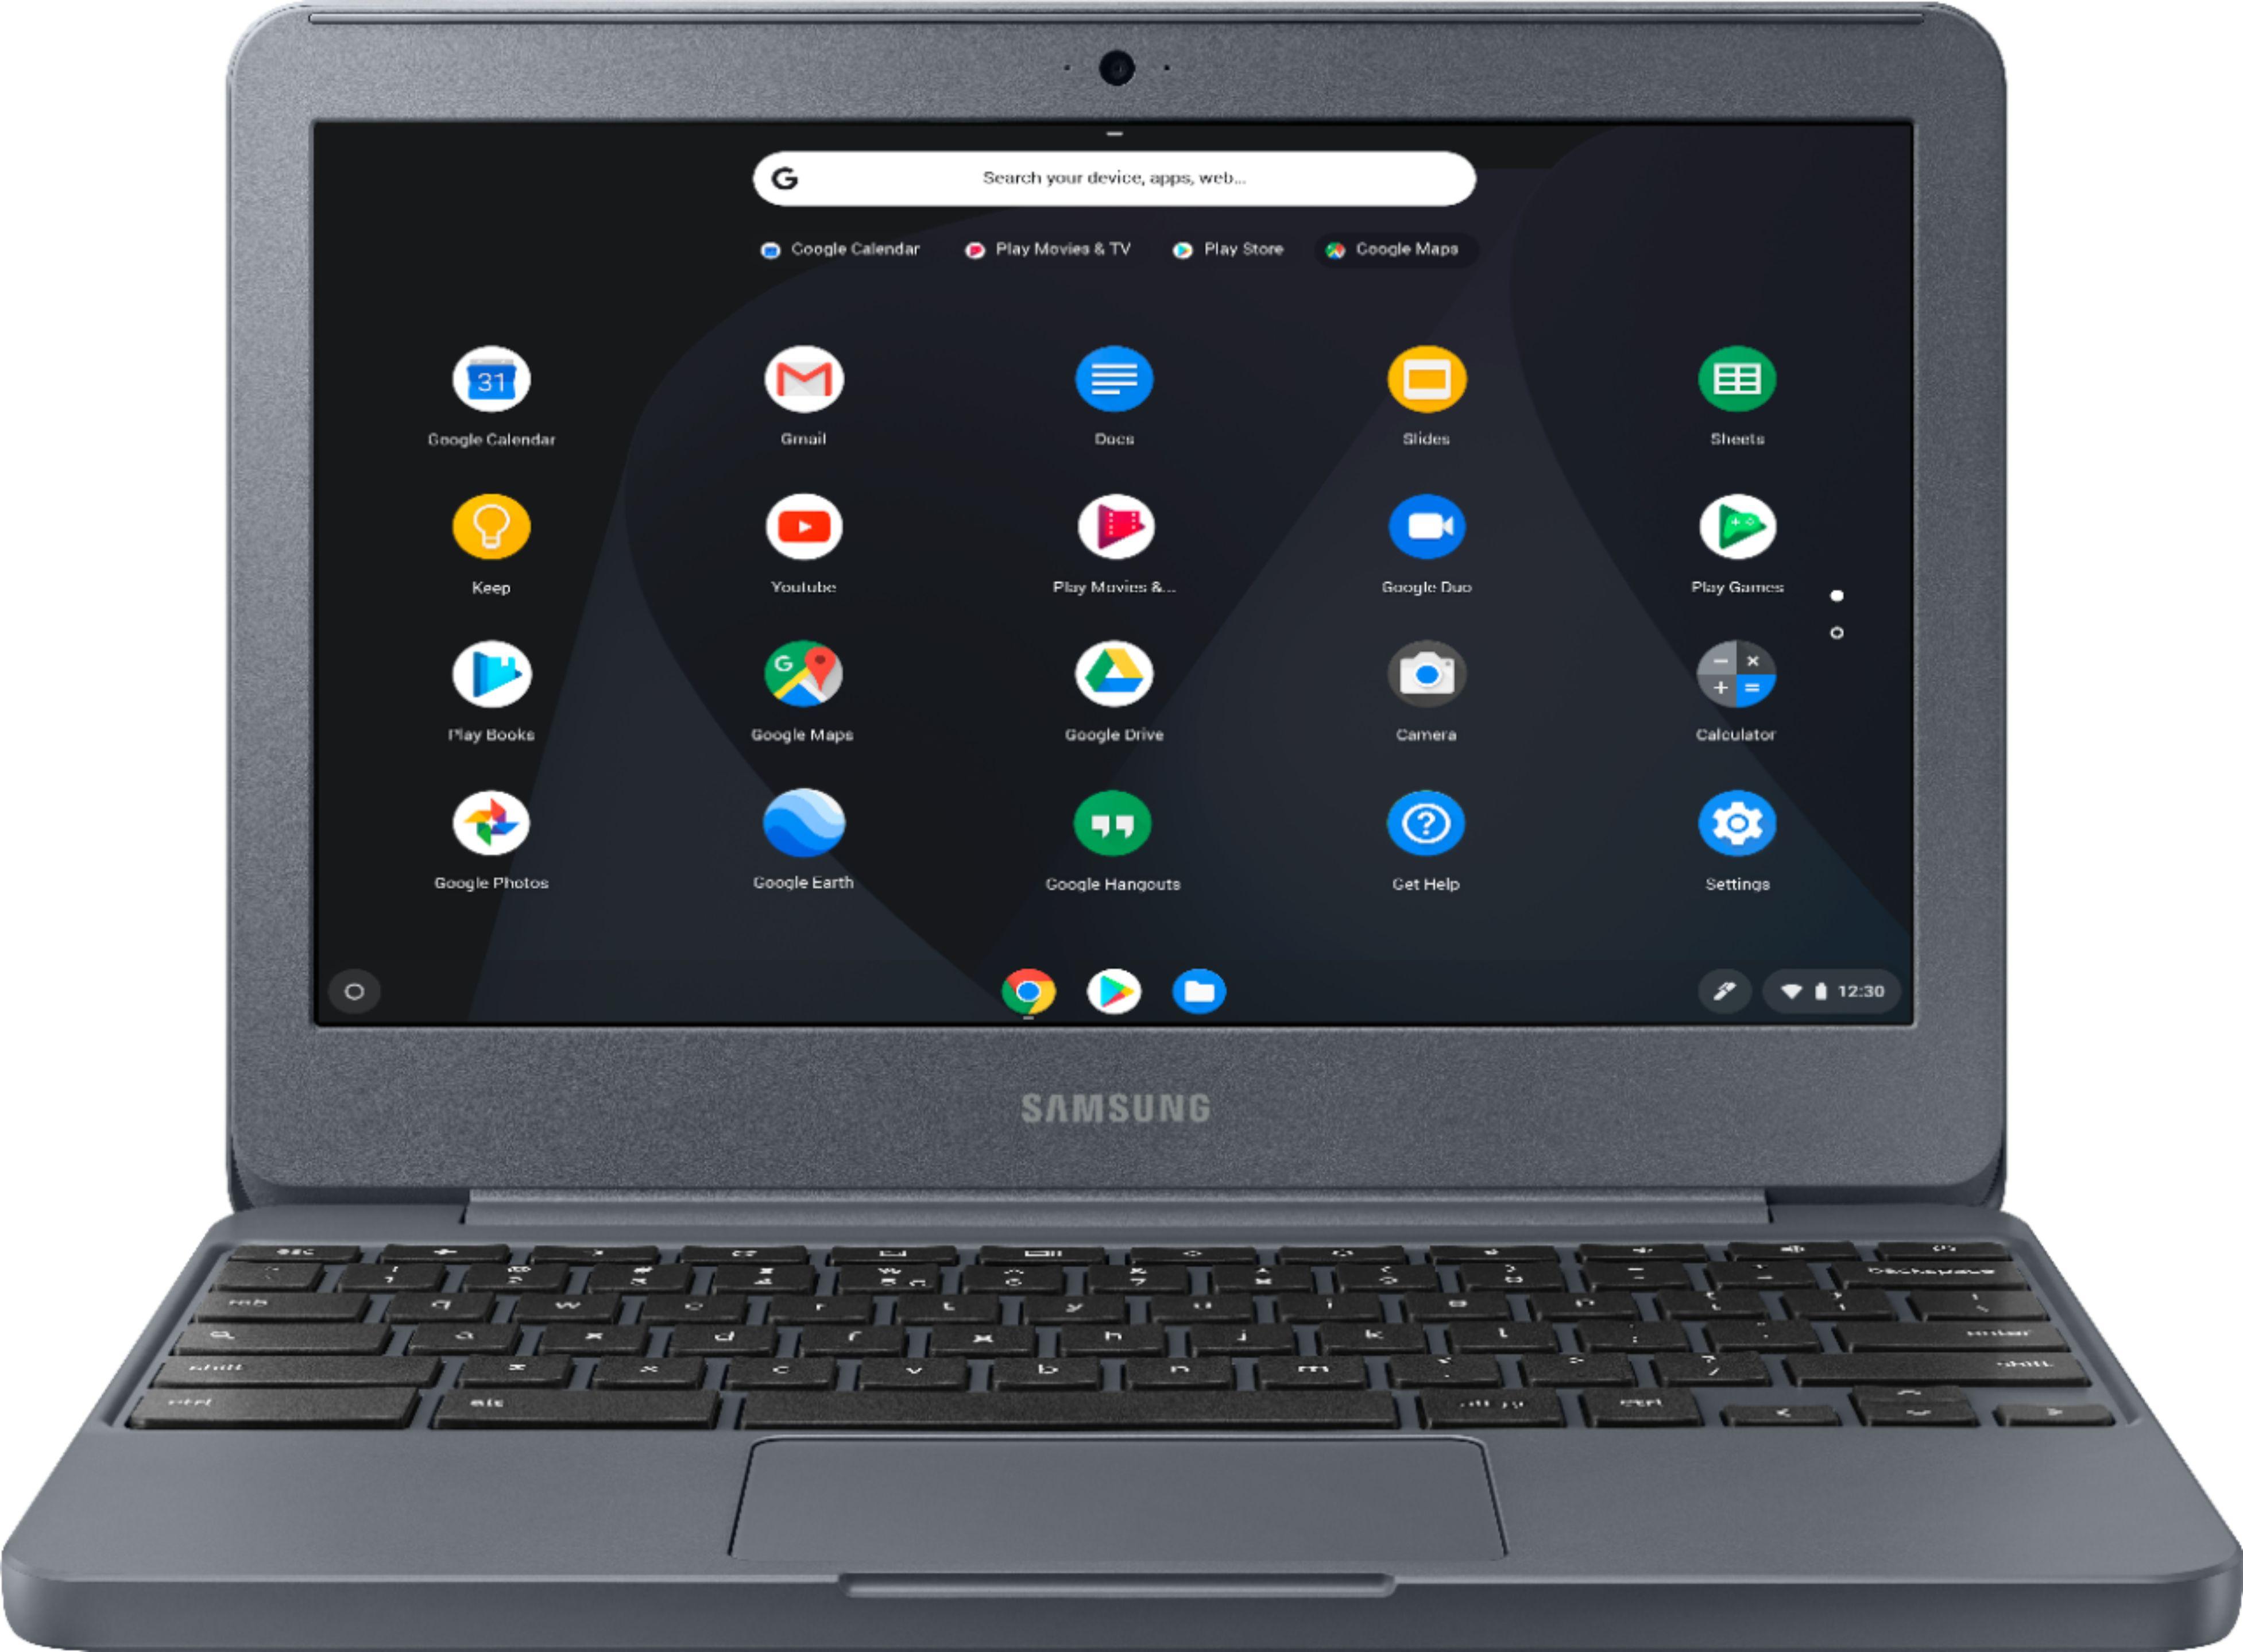 "Samsung Chromebook 3 Xe501c13-k02us, Intel Dual-core Celeron N3060, 11.6"" Hd, 4gb Ddr3, 32gb Emmc, Night Charcoal"